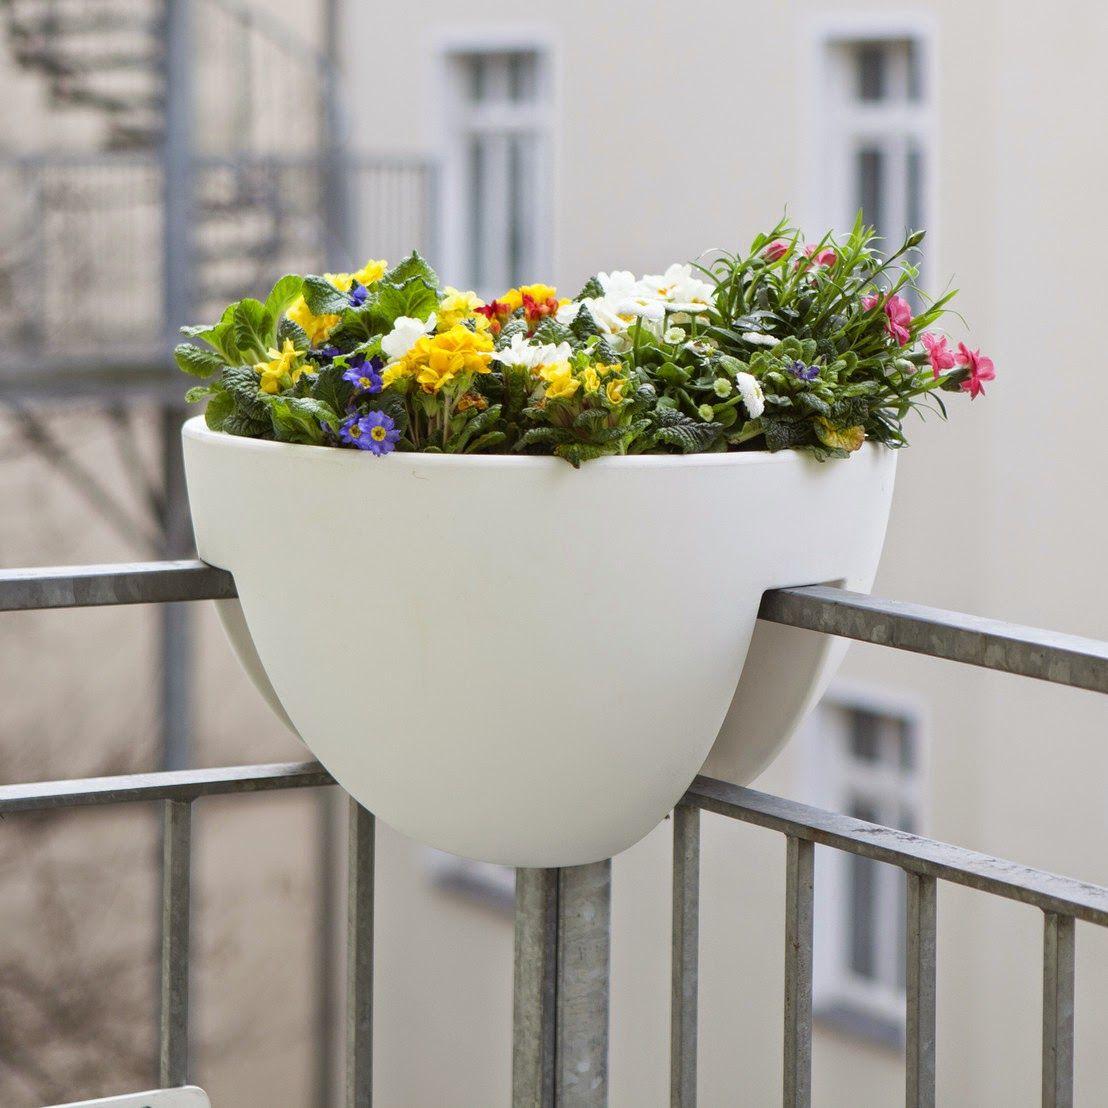 Gartenkunst Oder Wege Nach Eden Frische Ideen Fur Die Balkon Gestaltung Design Di Balcone Progettazione Di Giardini Mobili Da Balcone